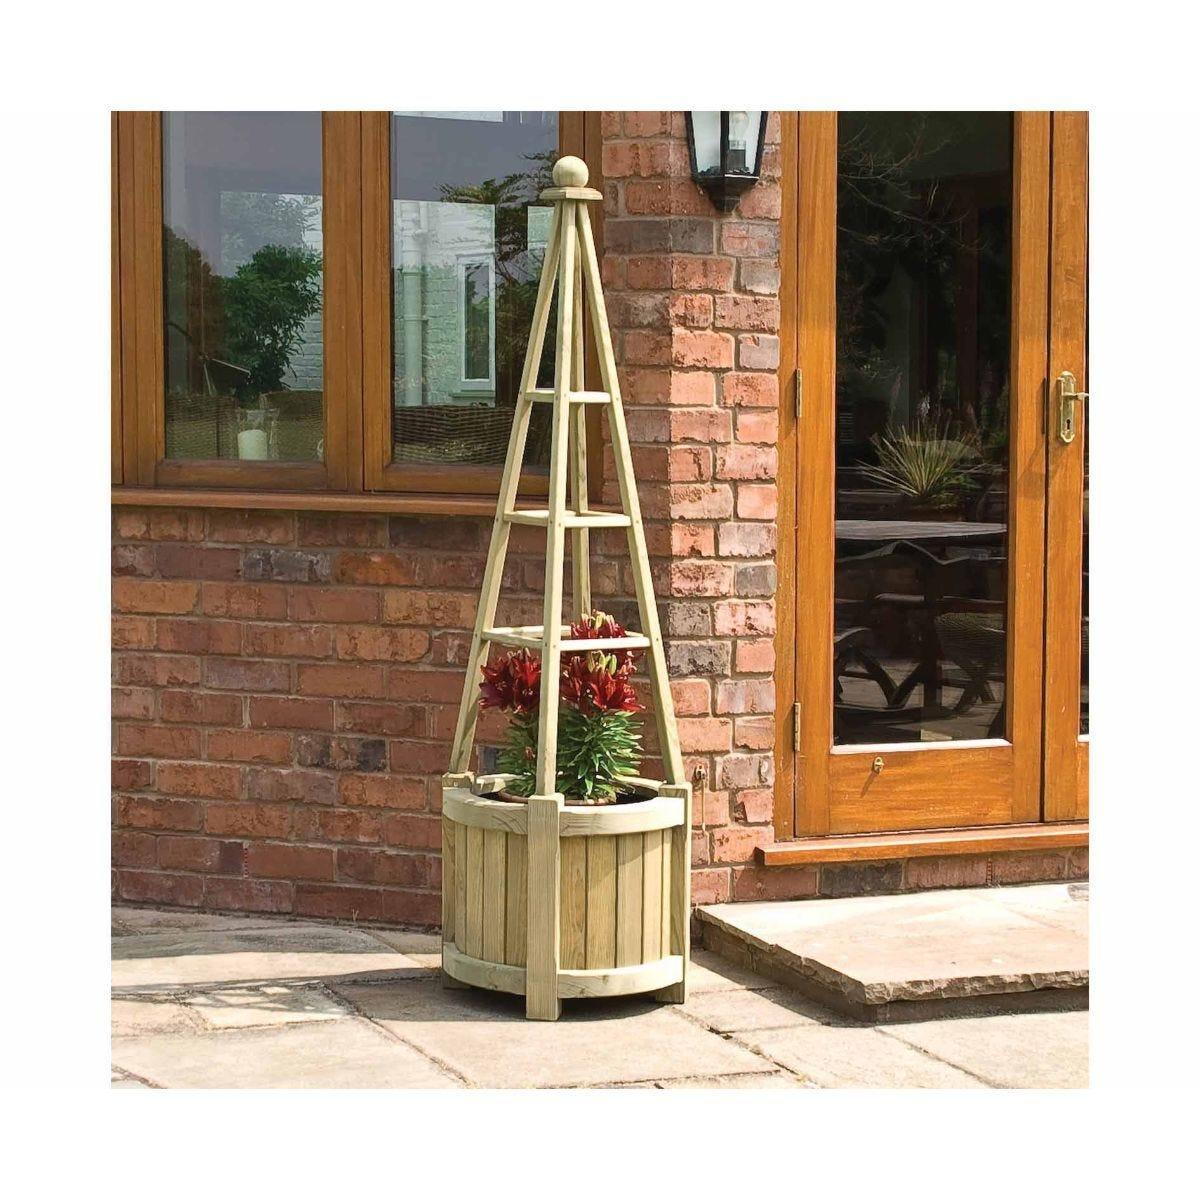 Rowlinson Marberry Obelisk Wooden Garden Planter